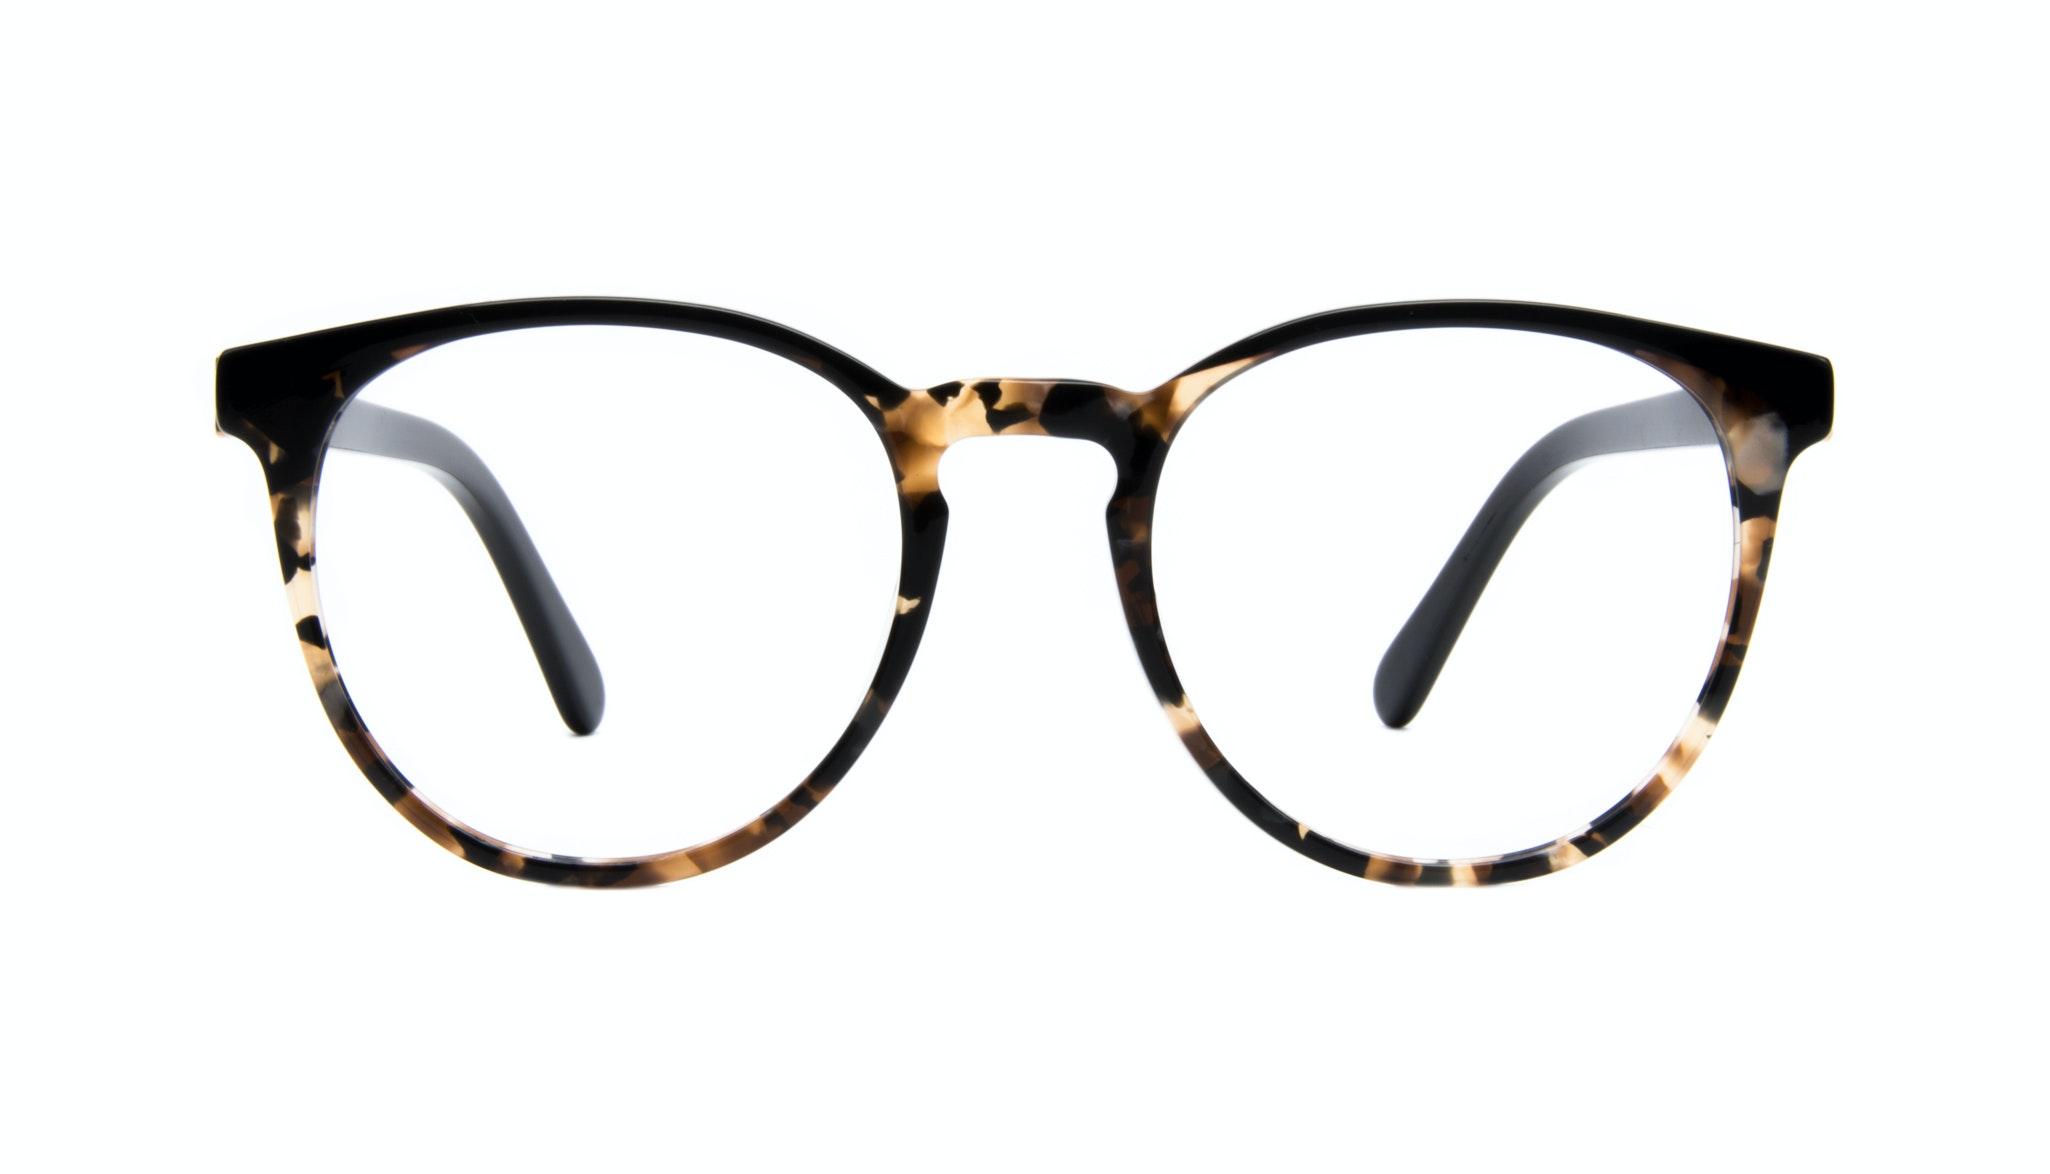 Affordable Fashion Glasses Round Eyeglasses Women Brilliant Dark Tortoise Front